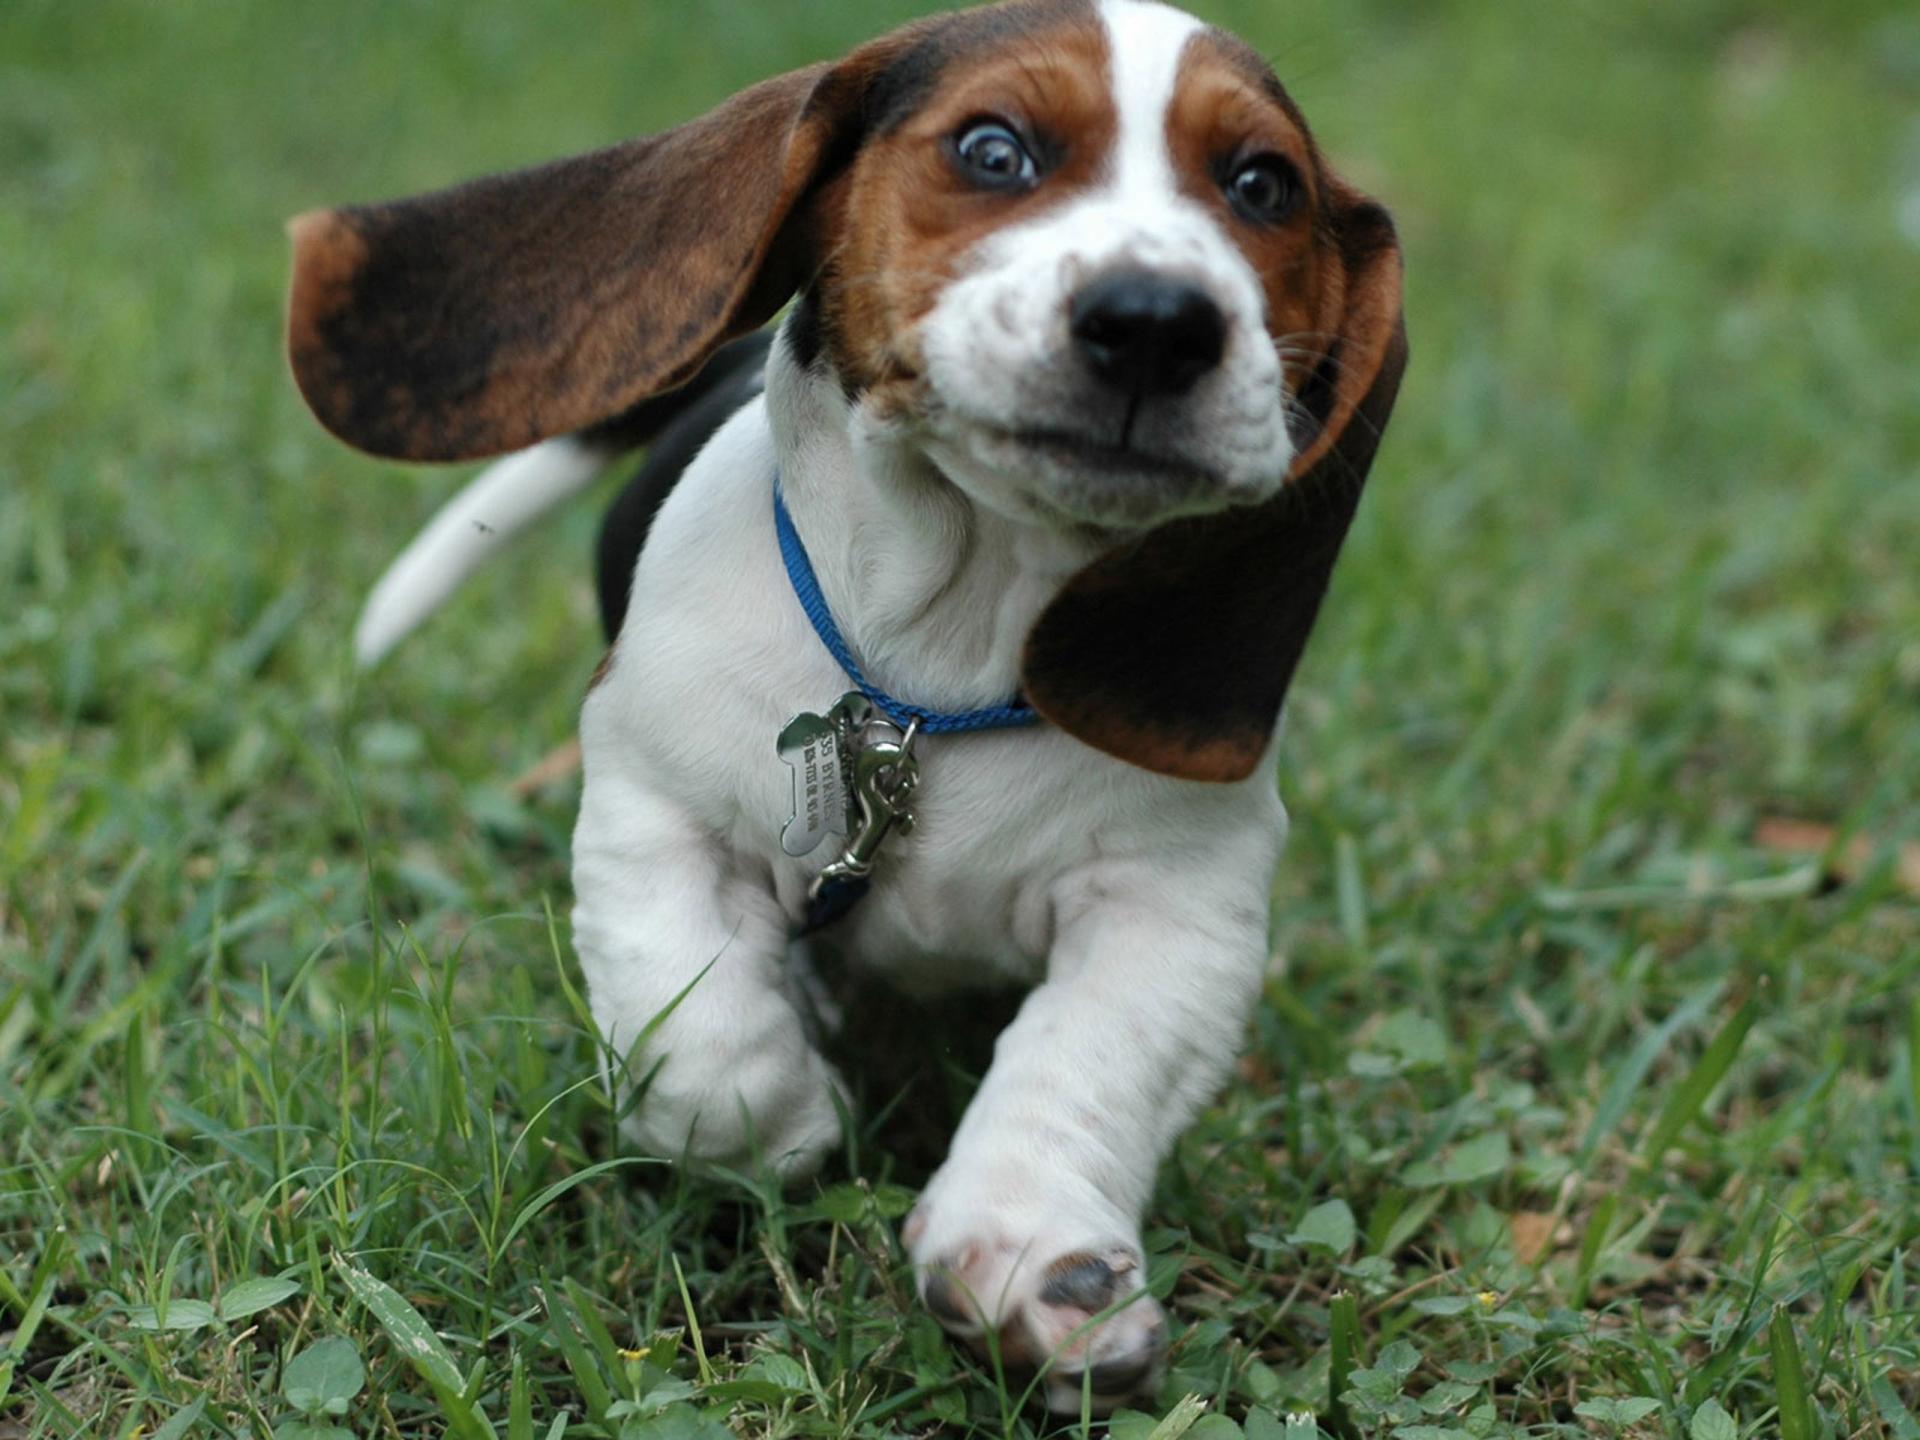 beagle puppy pictures pocket beagle puppy pocket beagle teacup beagle 1920x1440